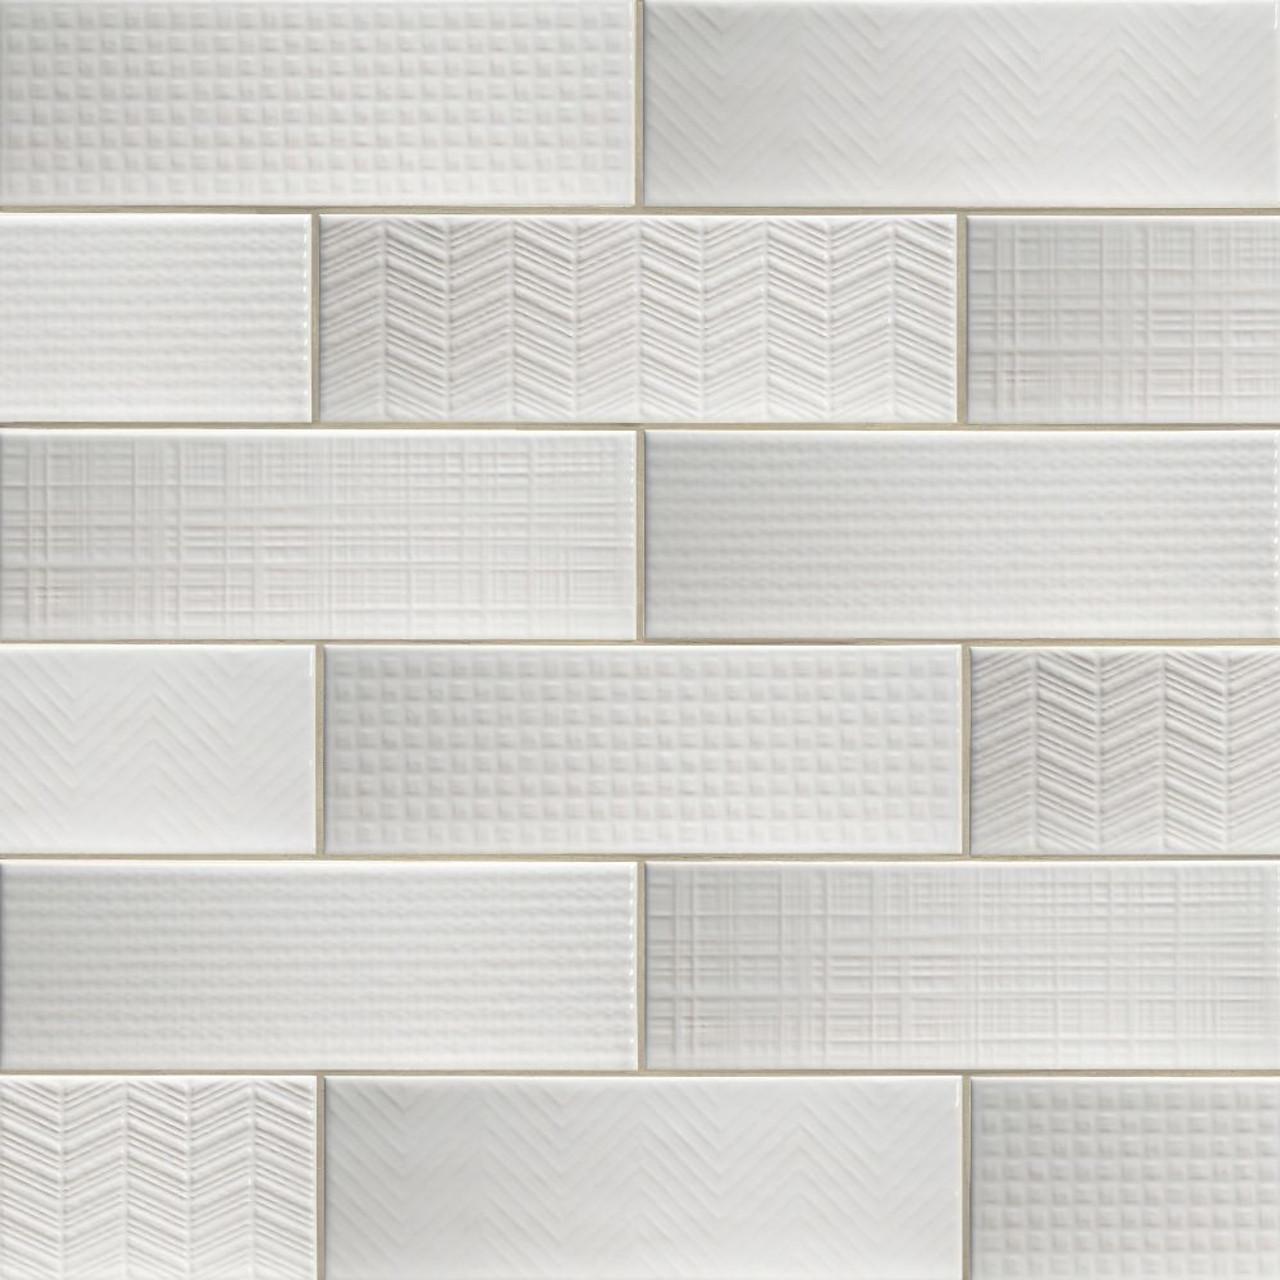 ms international backsplash series urbano pure 3d mix 4x12 glossy ceramic subway tile nurbpurmix4x12